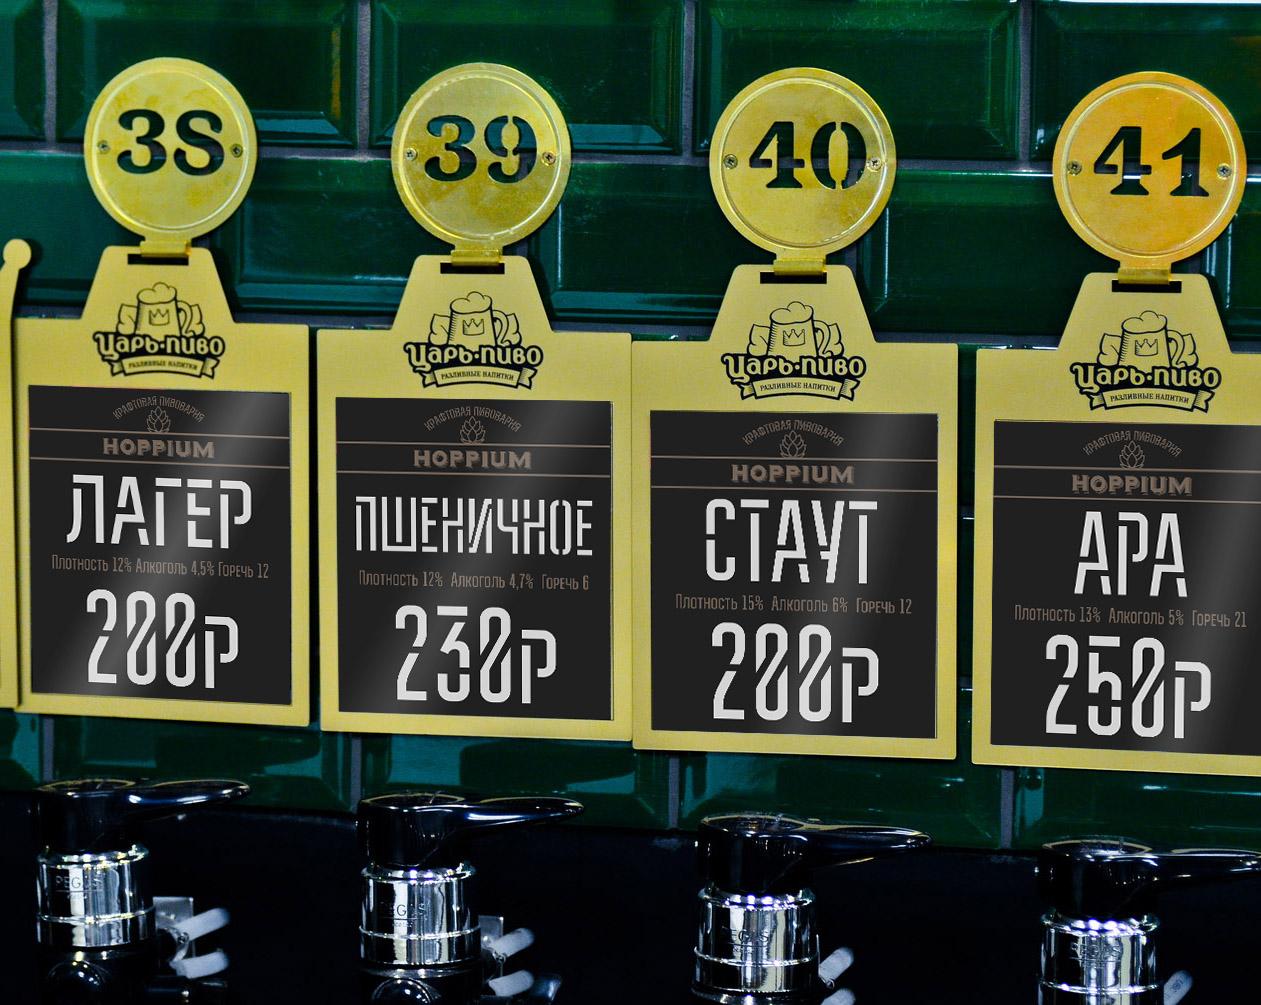 Логотип + Ценники для подмосковной крафтовой пивоварни фото f_3785dc2a6c50b5f2.jpg